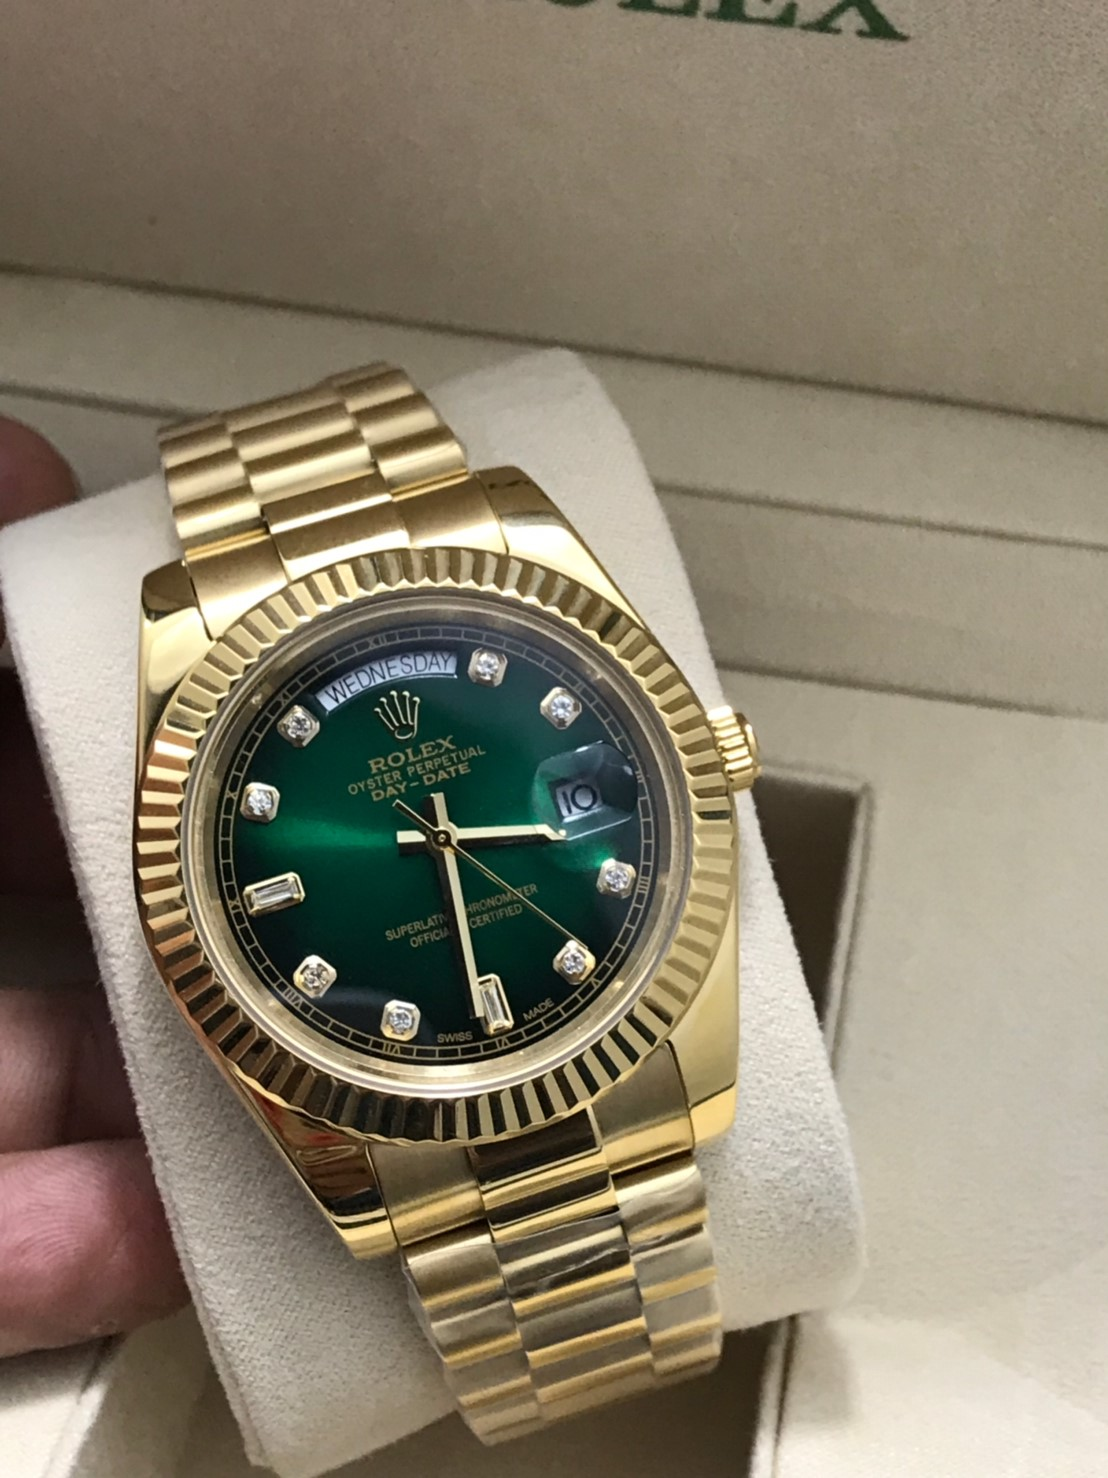 Rolex Day Date 18k Yellow Gold 40mm Green Dial, โรเล็กซ์เดย์เดทก๊อปเรือนทอง หน้าปัดเขียว